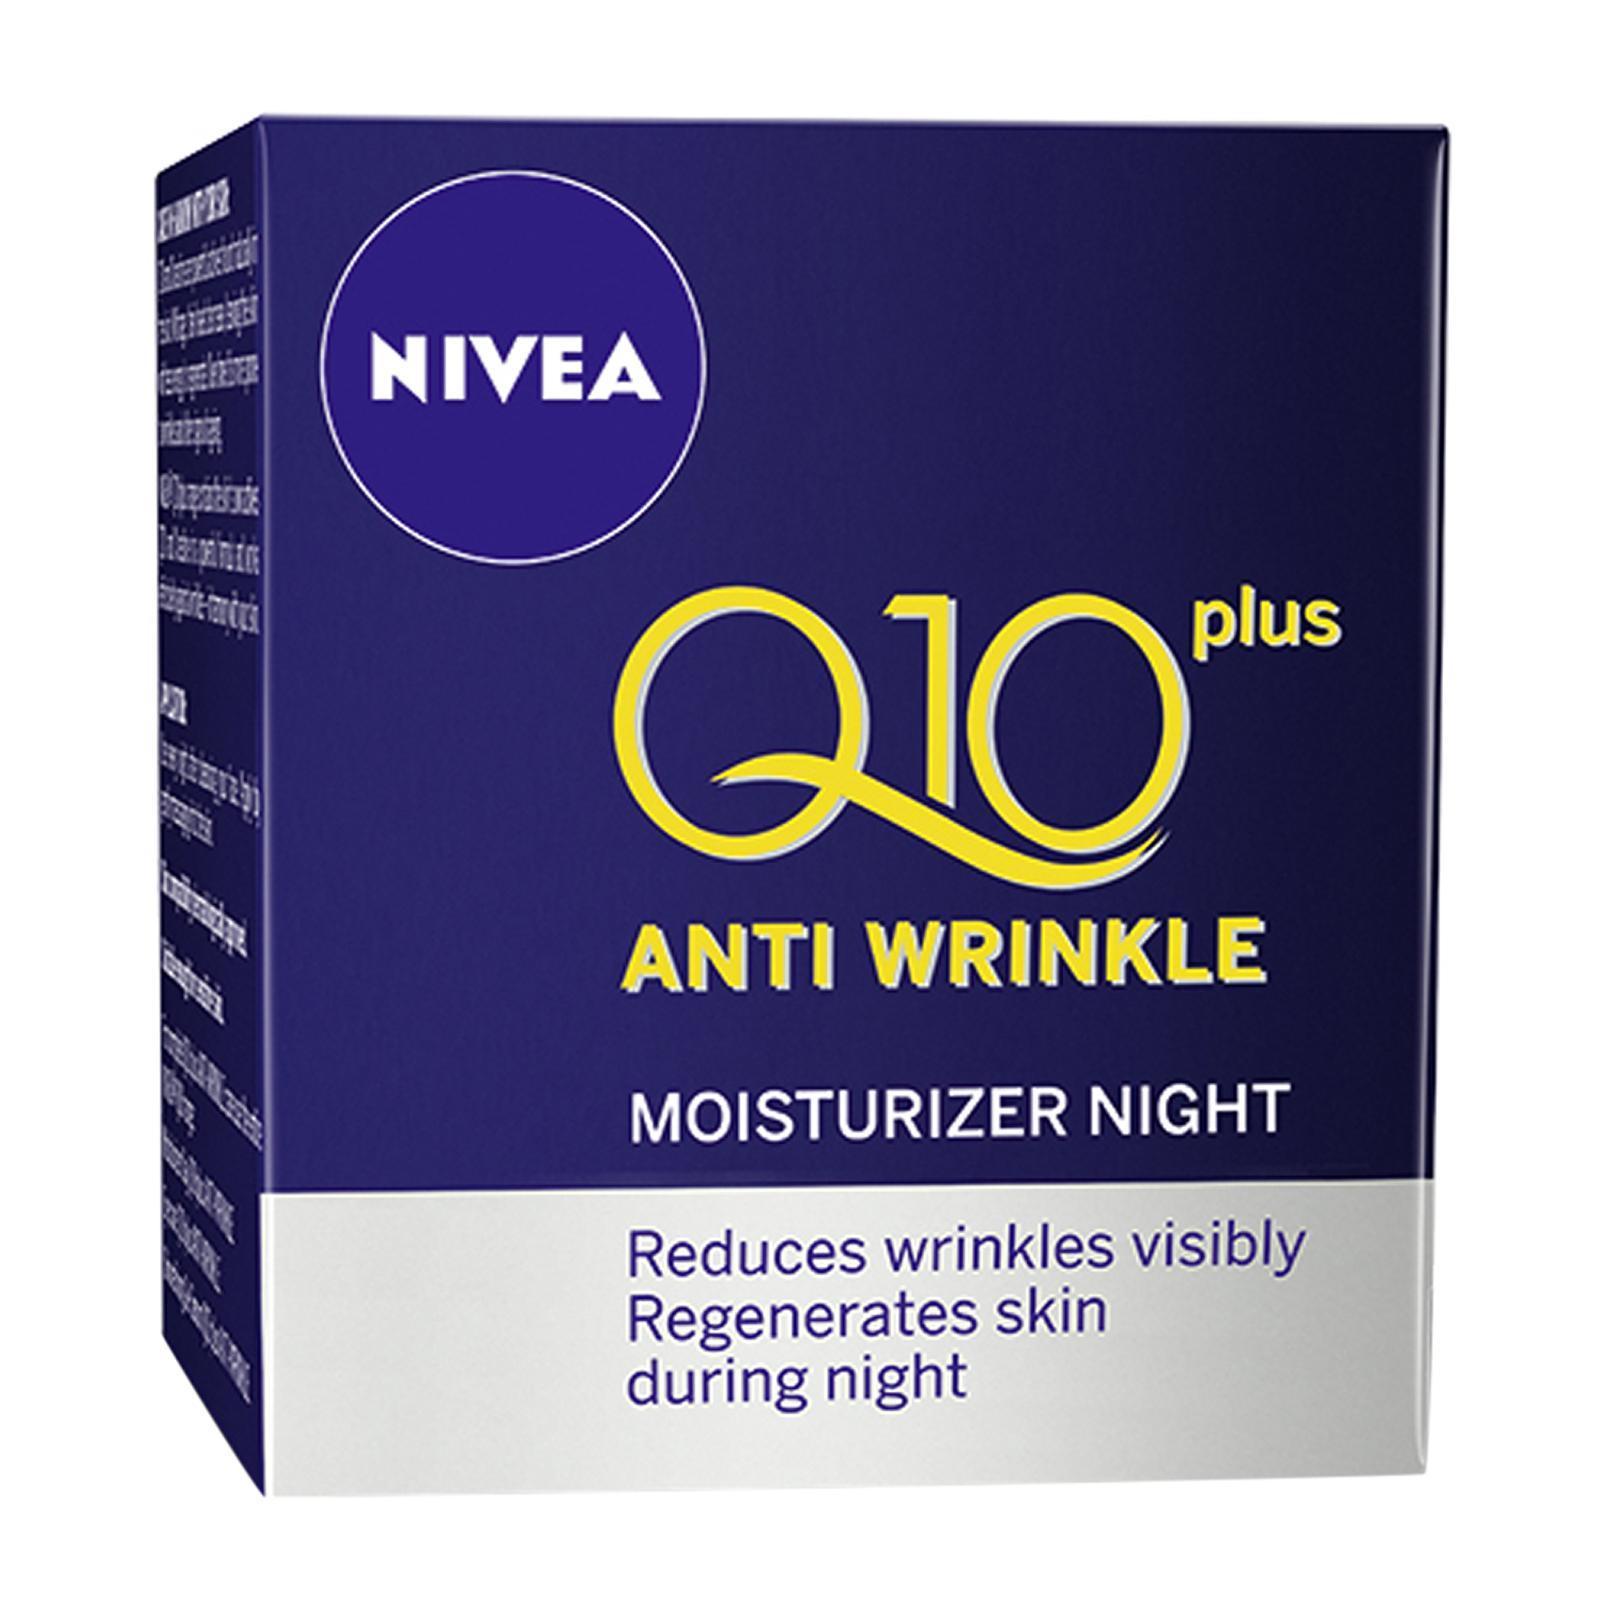 Nivea Face Care for Women Moisturiser Antiwrinkle Q10 Plus Night Care